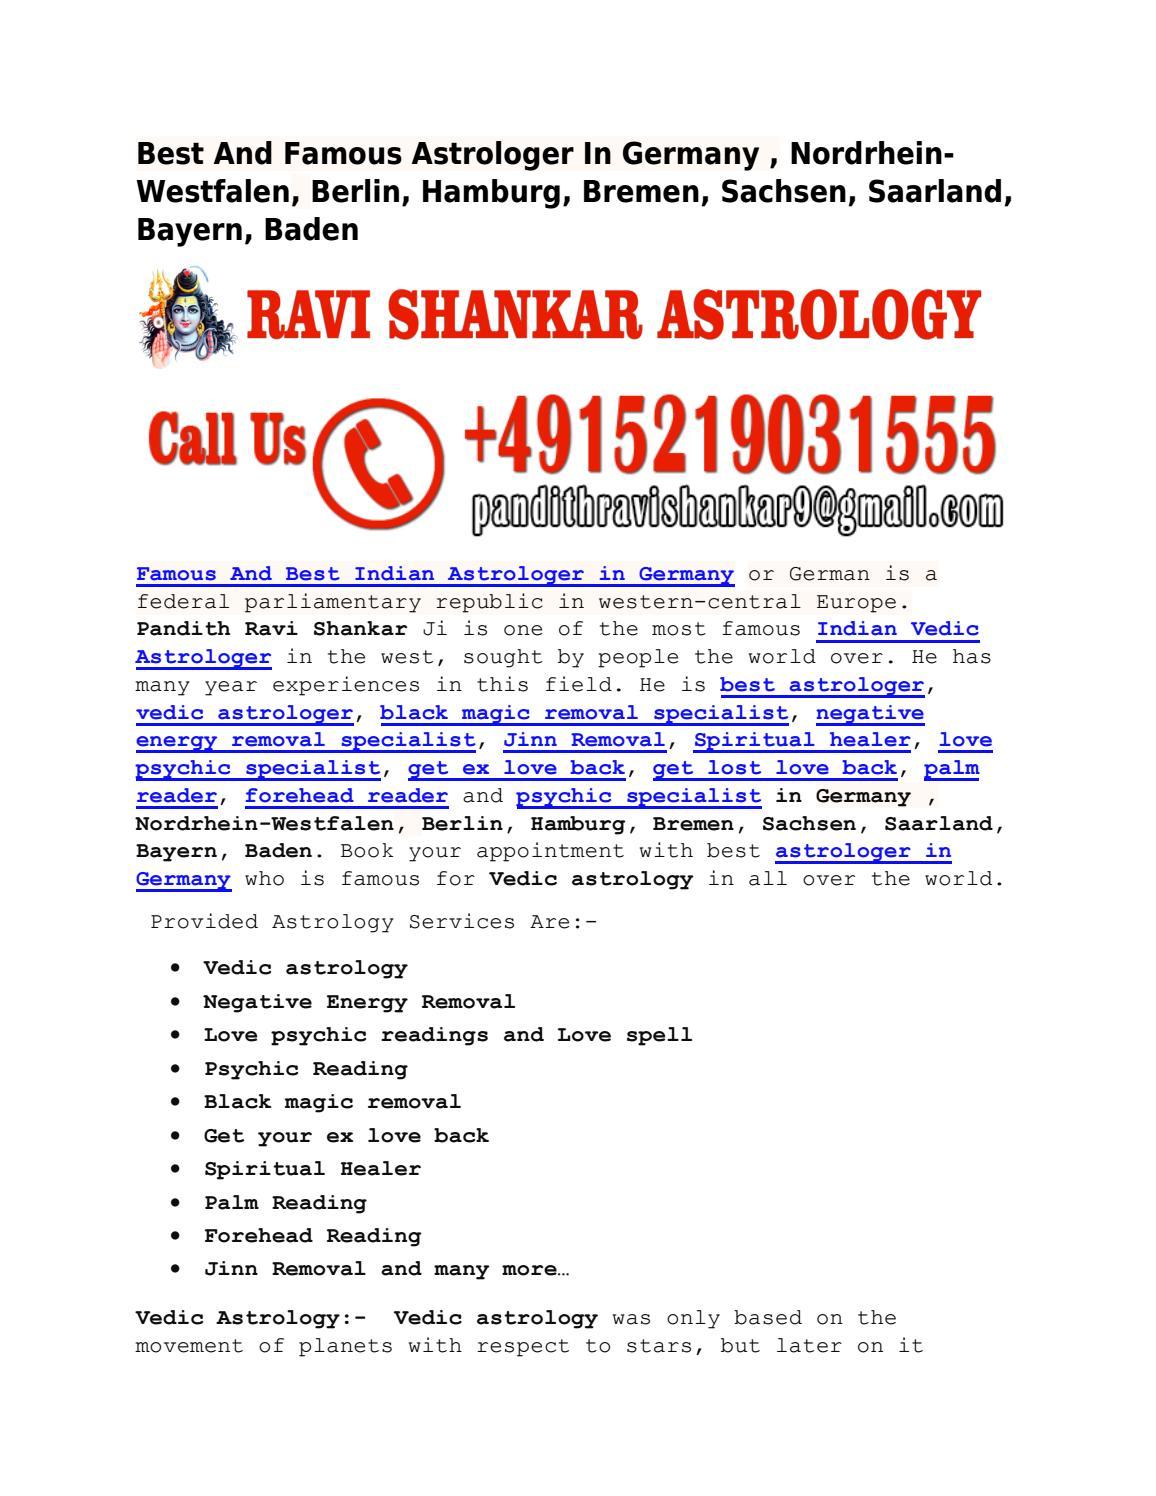 Best And Famous Astrologer In Germany , Nordrhein-Westfalen, Berlin